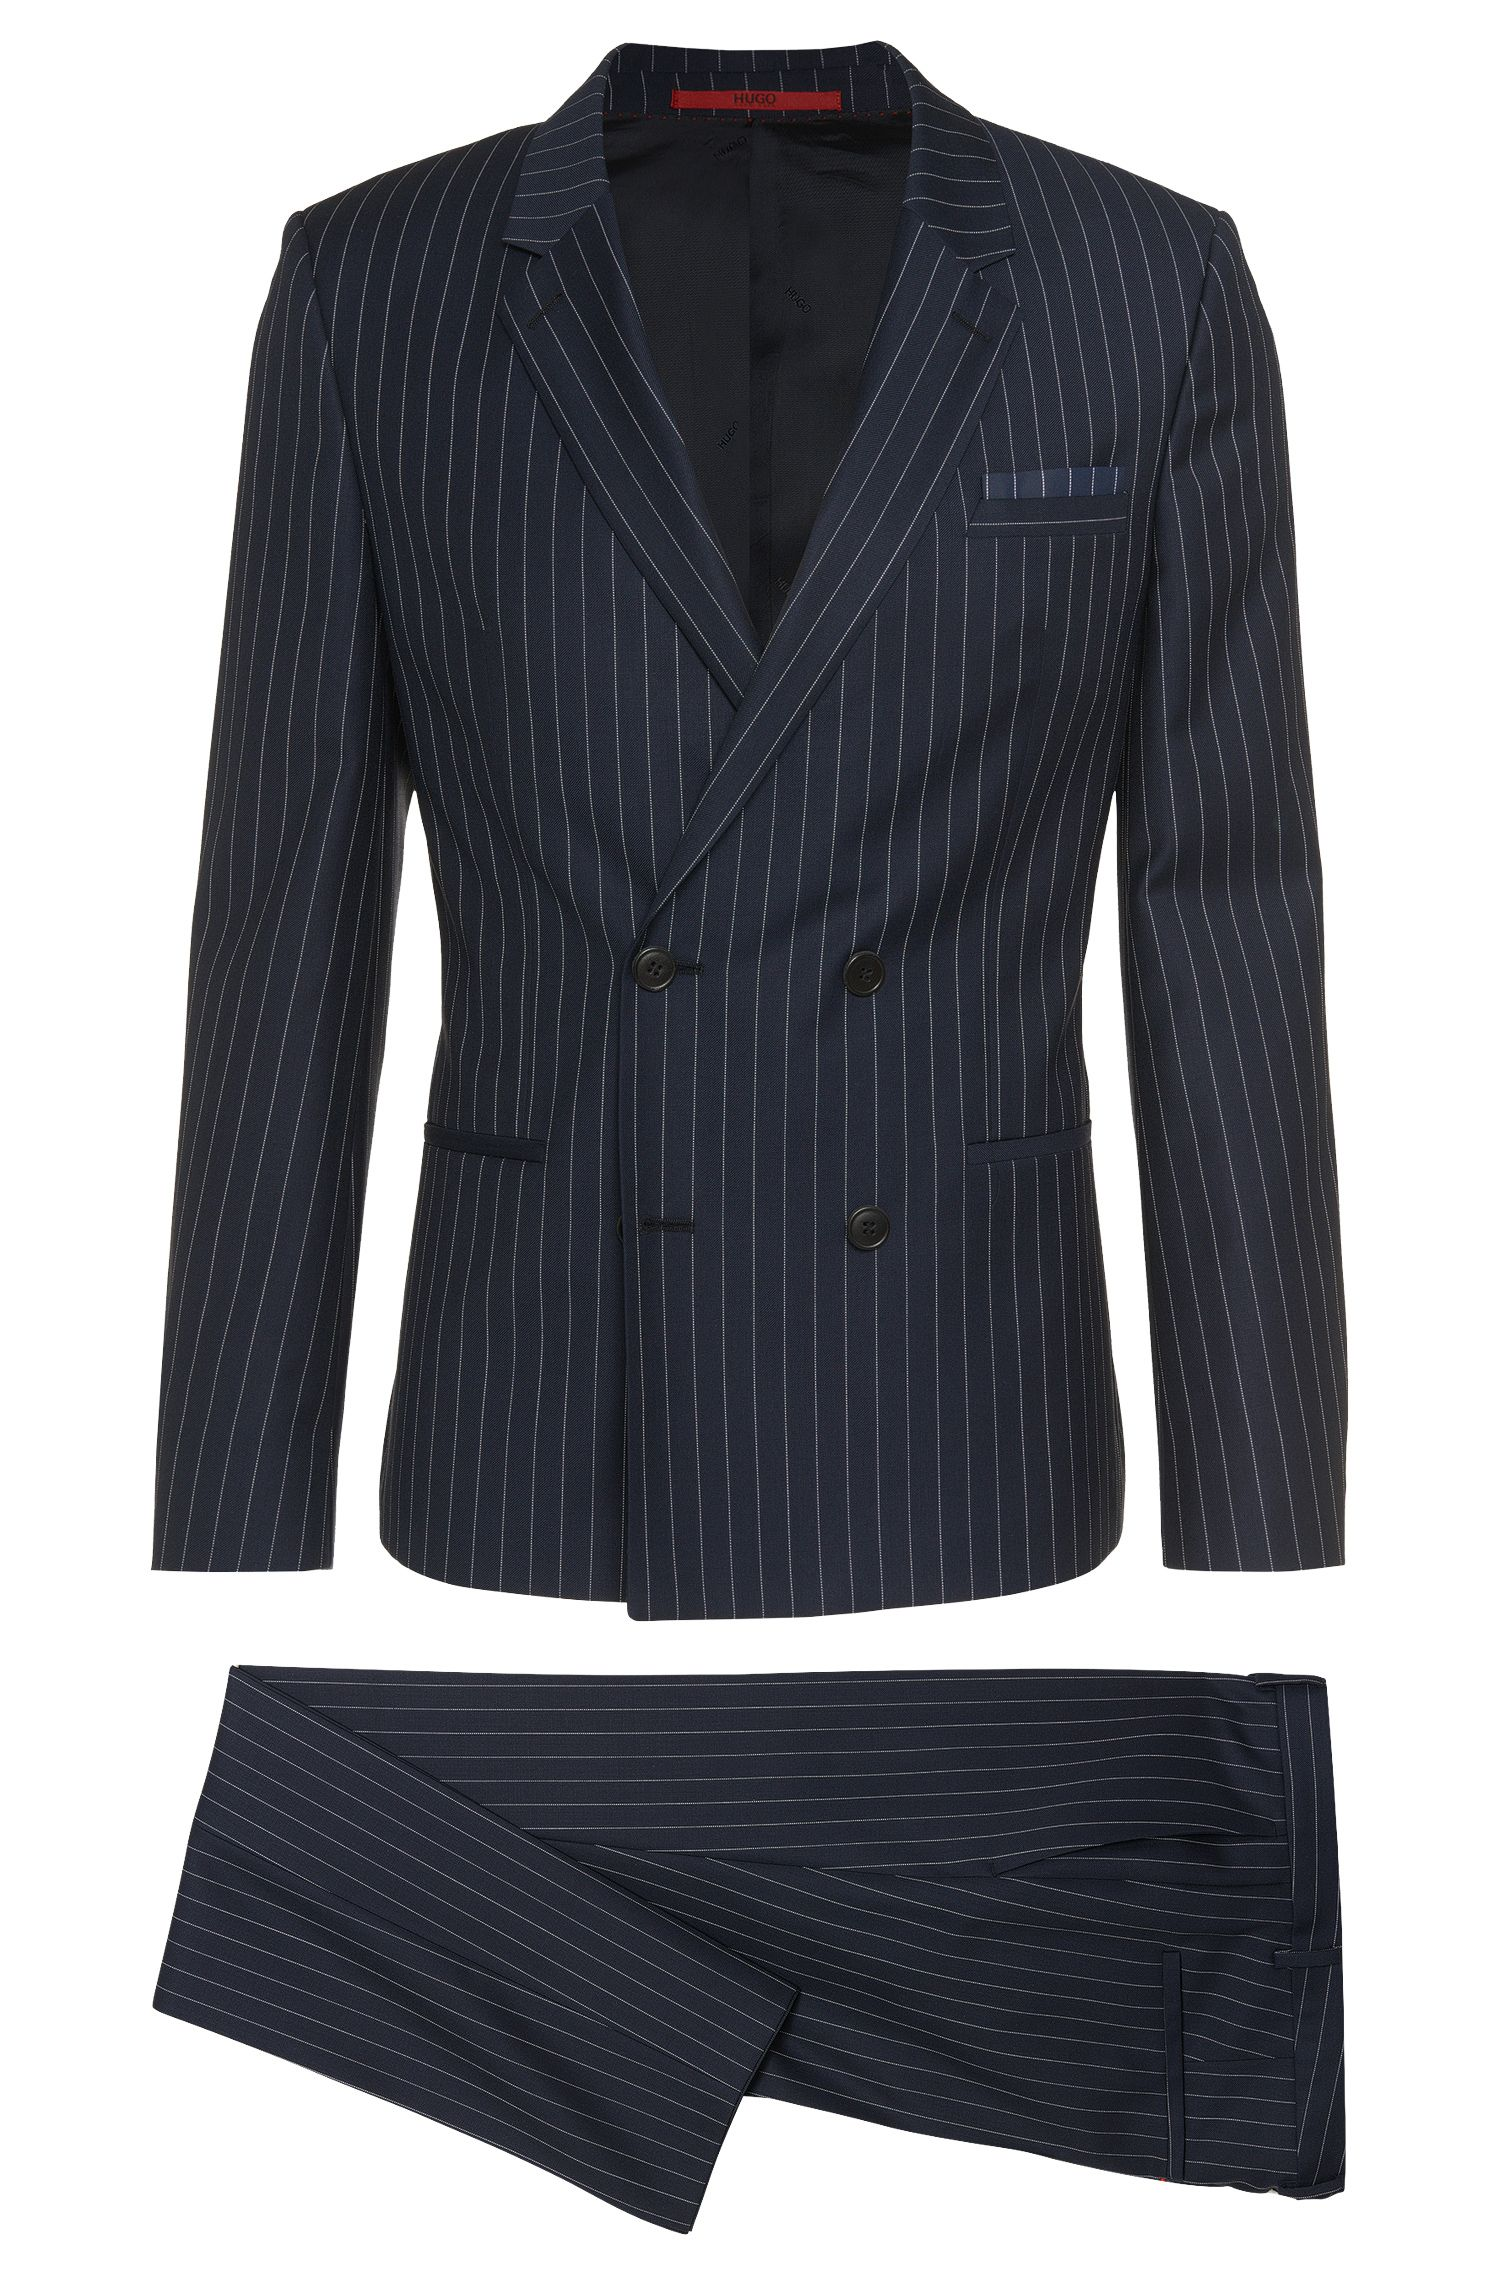 'Aralt/Herlon' | Slim Fit, Super 100 Virgin Wool Suit